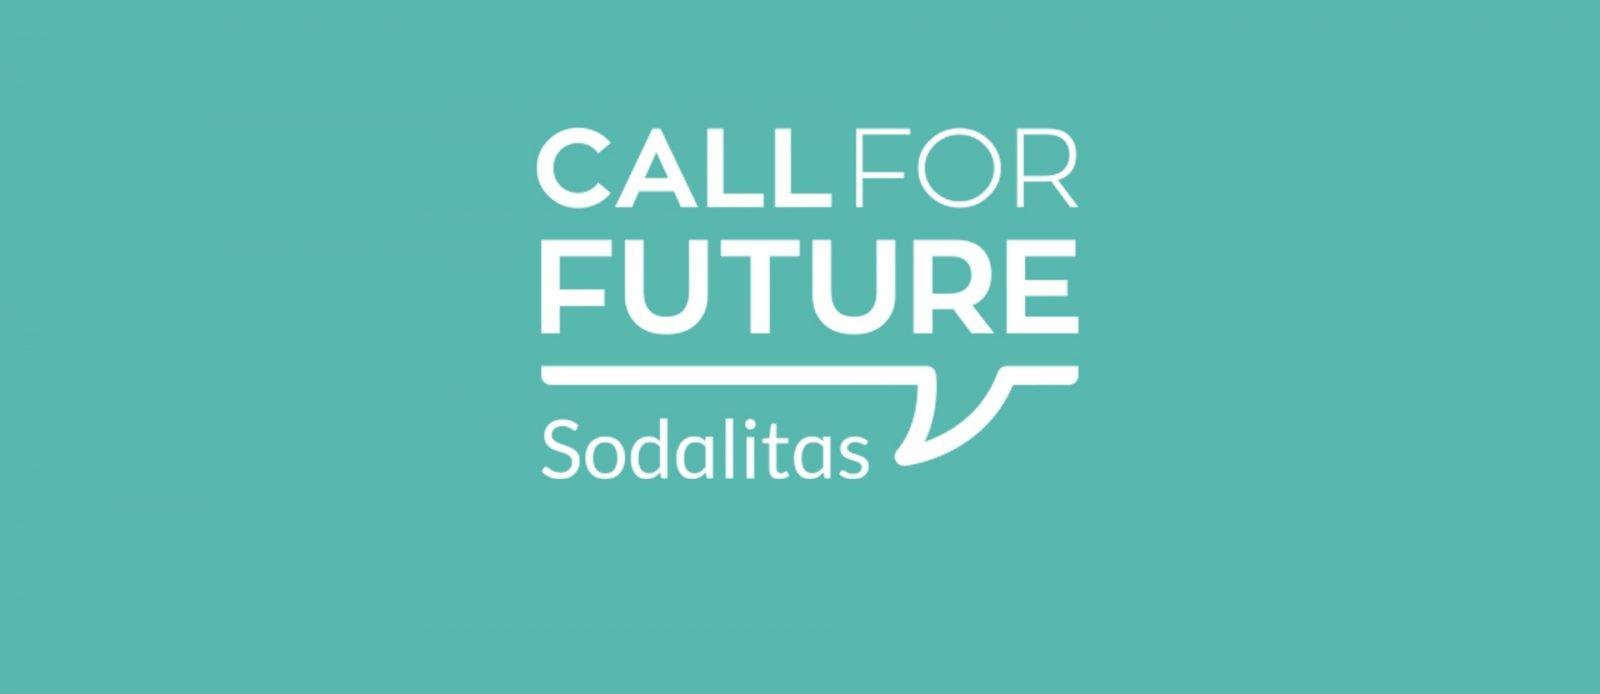 Sodalitas Call for Future